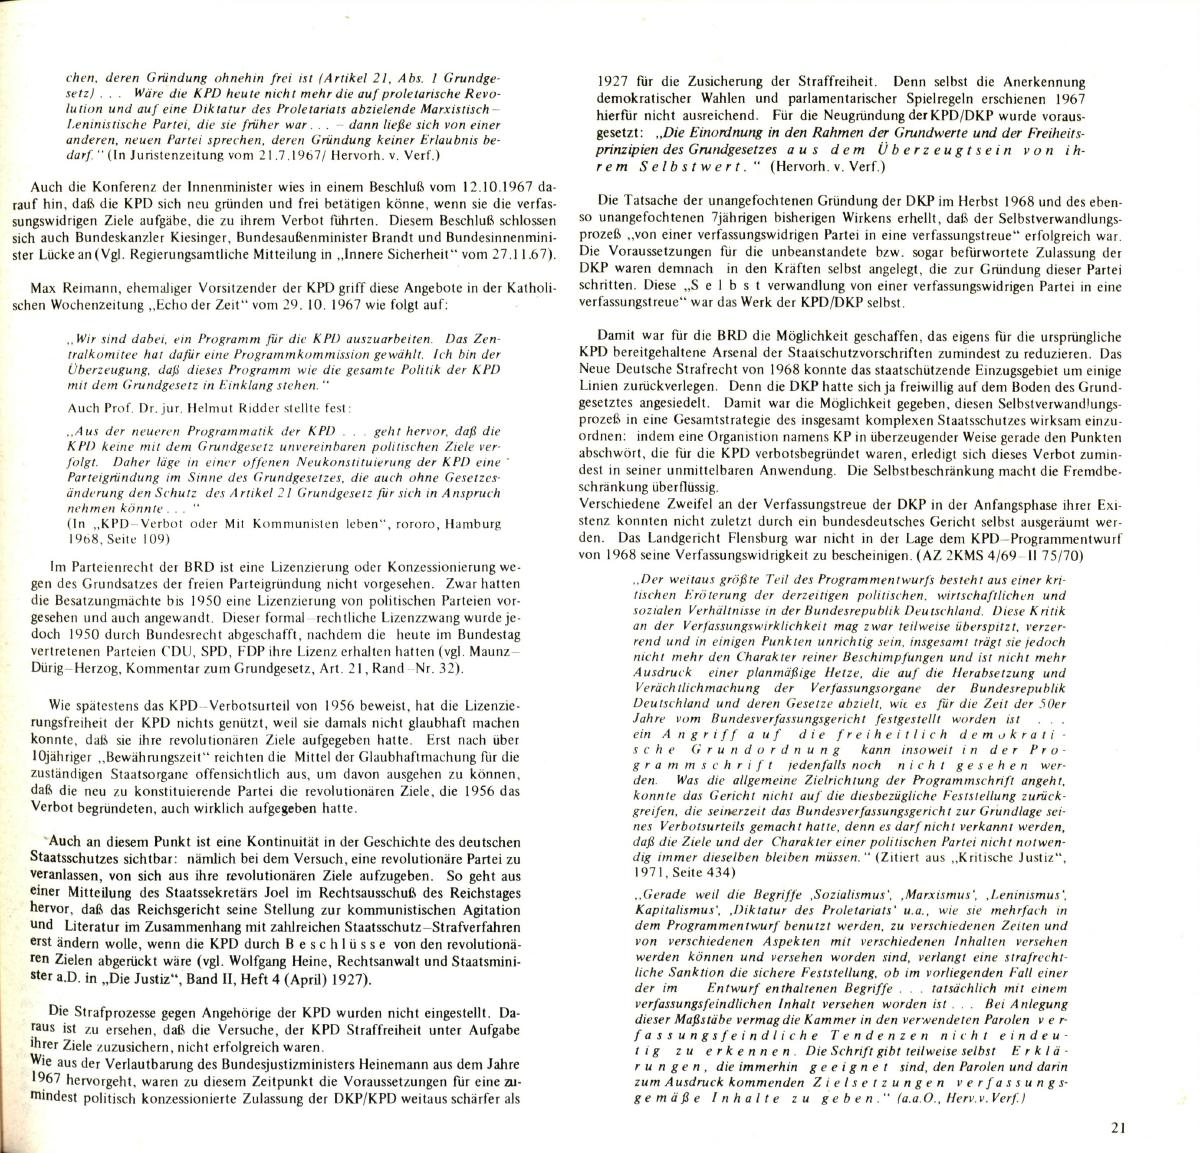 REP_VLB_1976_Die_Zensurgesetze_22